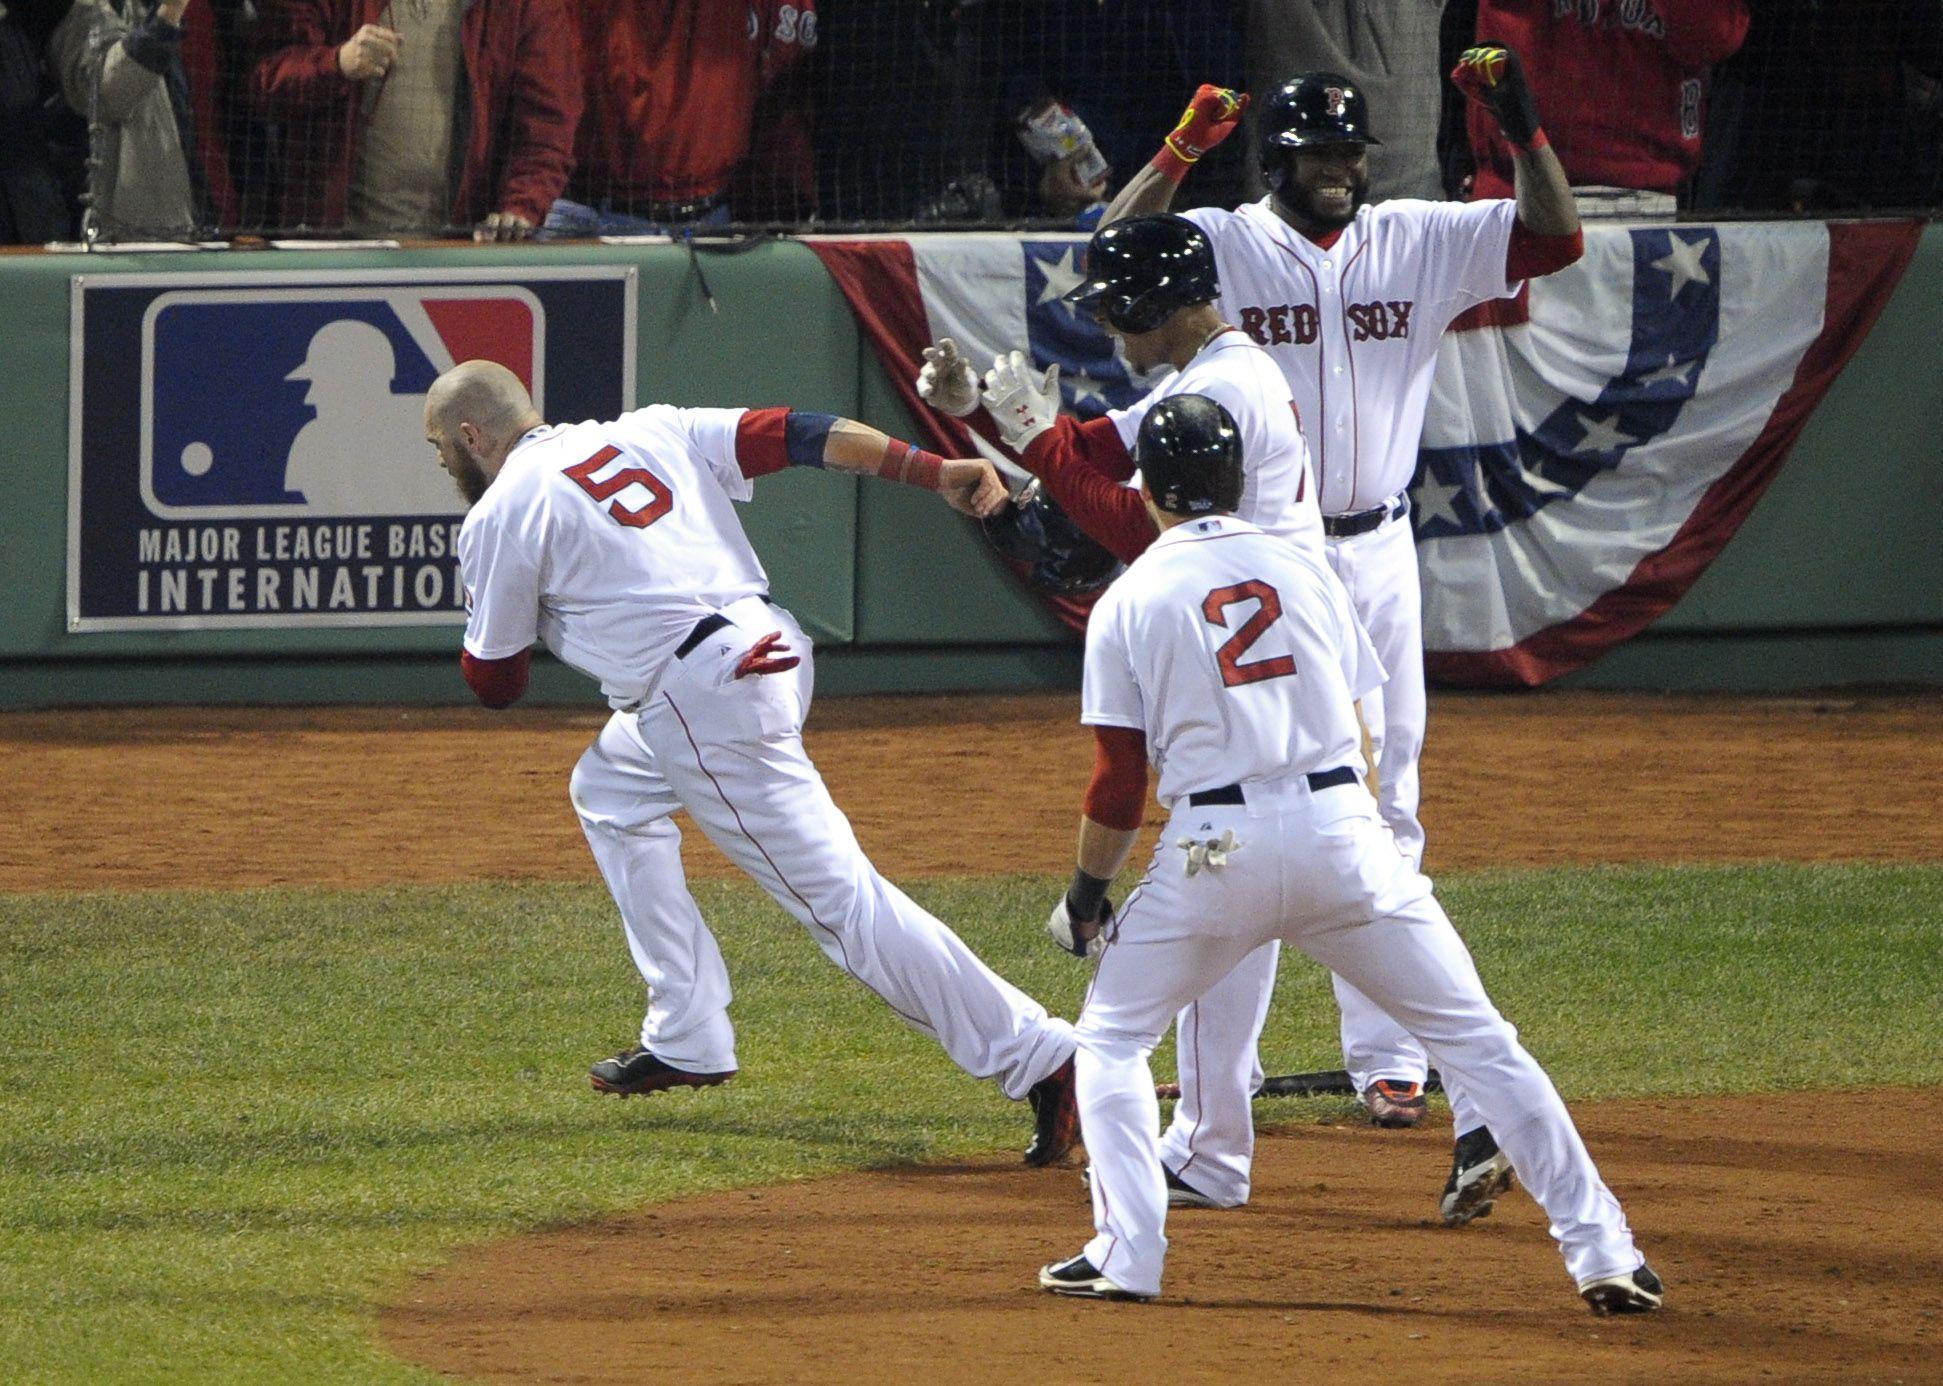 Crowdcam Hot Shot Boston Red Sox Left Fielder Jonny Gomes Celebrates With Teammates Jacoby Ellsbury David Ortiz Baseball World Series Boston Red Sox Red Sox